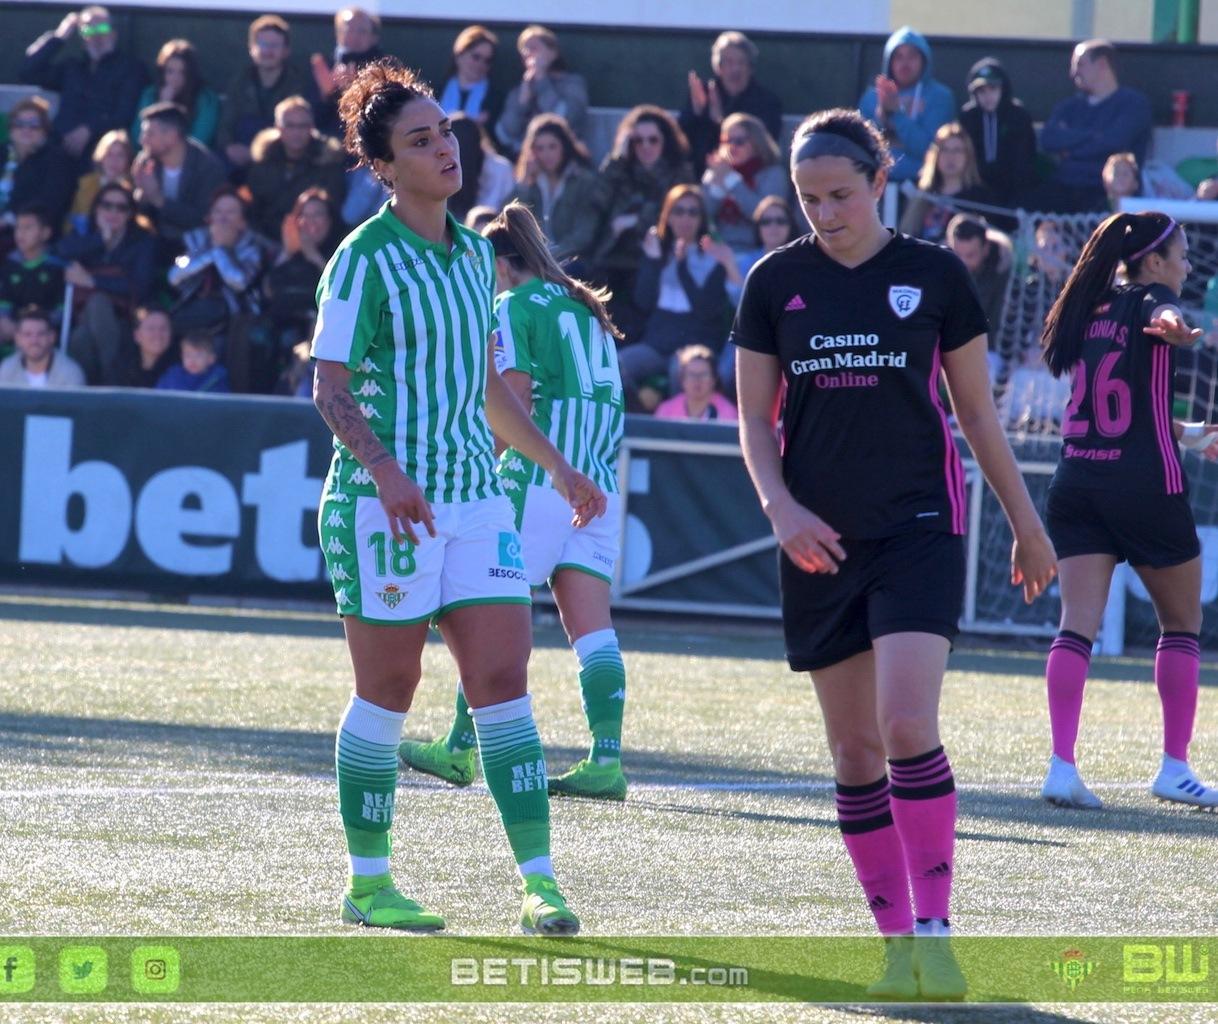 J16-Betis-Fem-Madrid-96